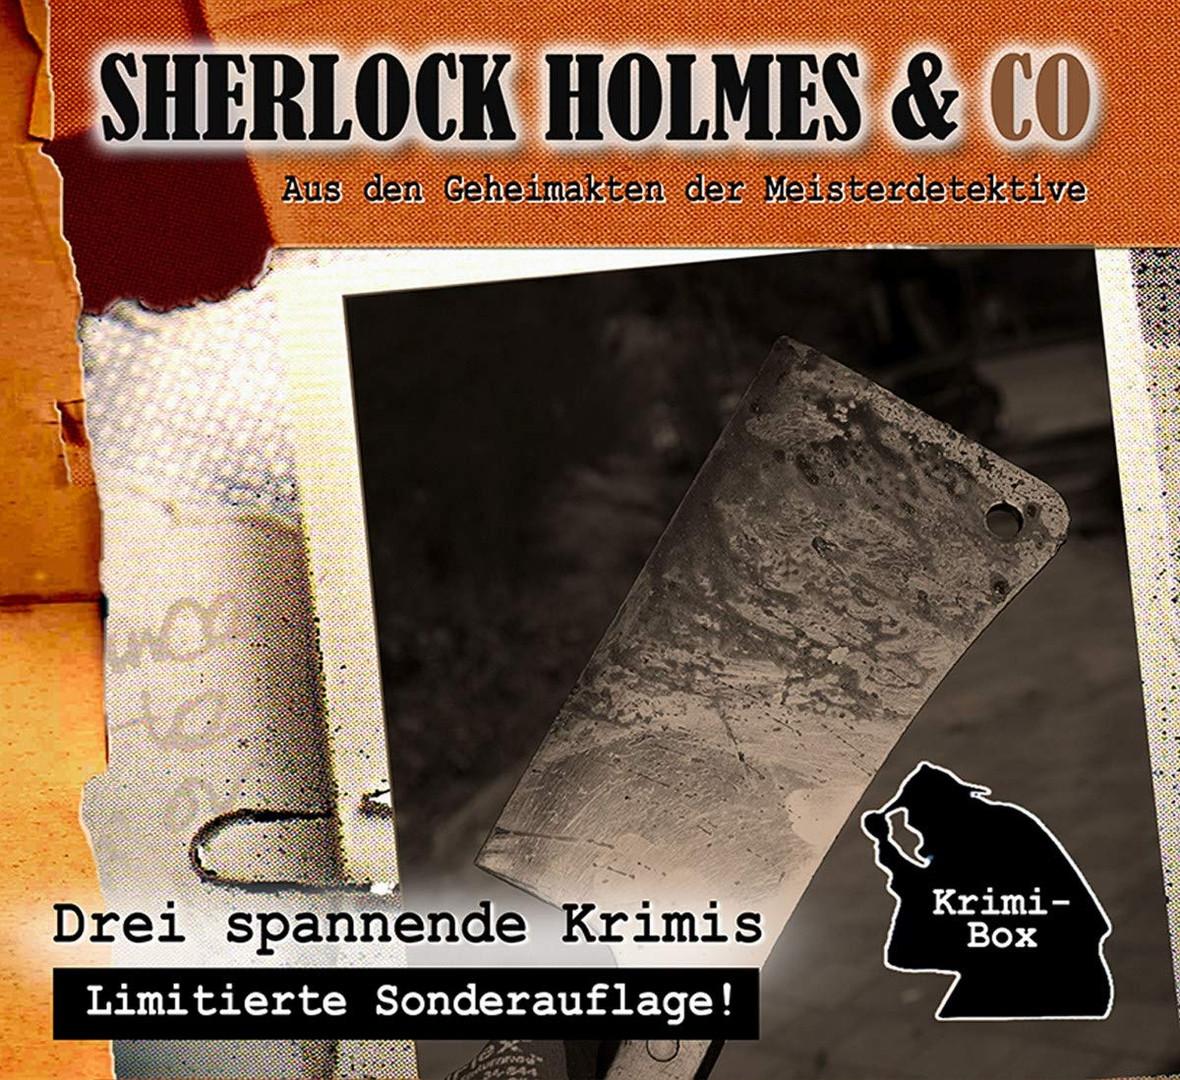 Sherlock Holmes und Co. Krimi-Box 12